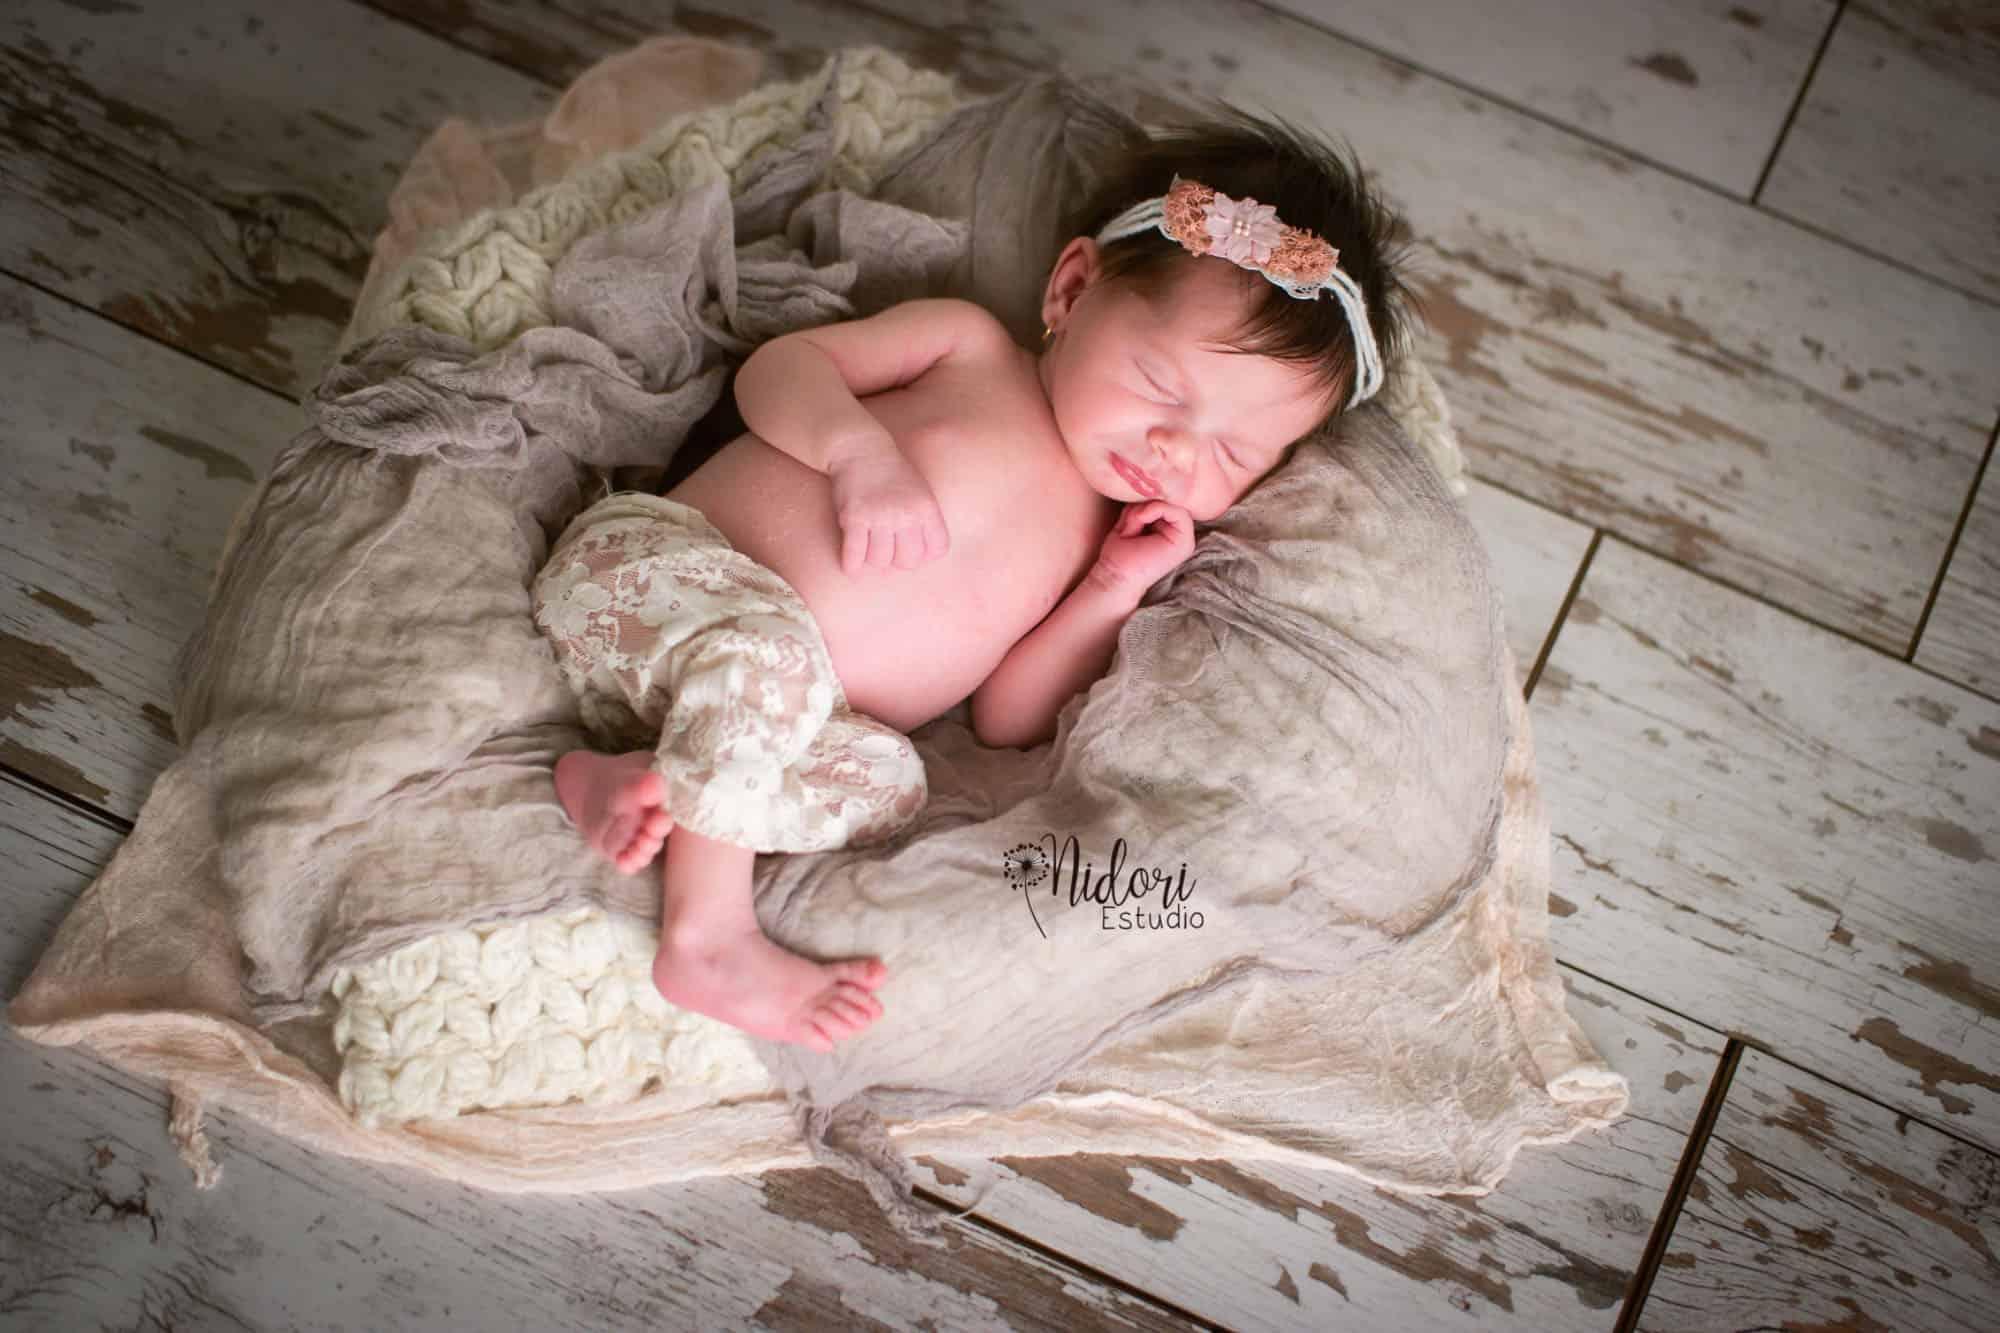 seguimiento-fotografia-niños-bebes-nidoriestudio-fotos-valencia-almazora-castellon-españa-spain-19